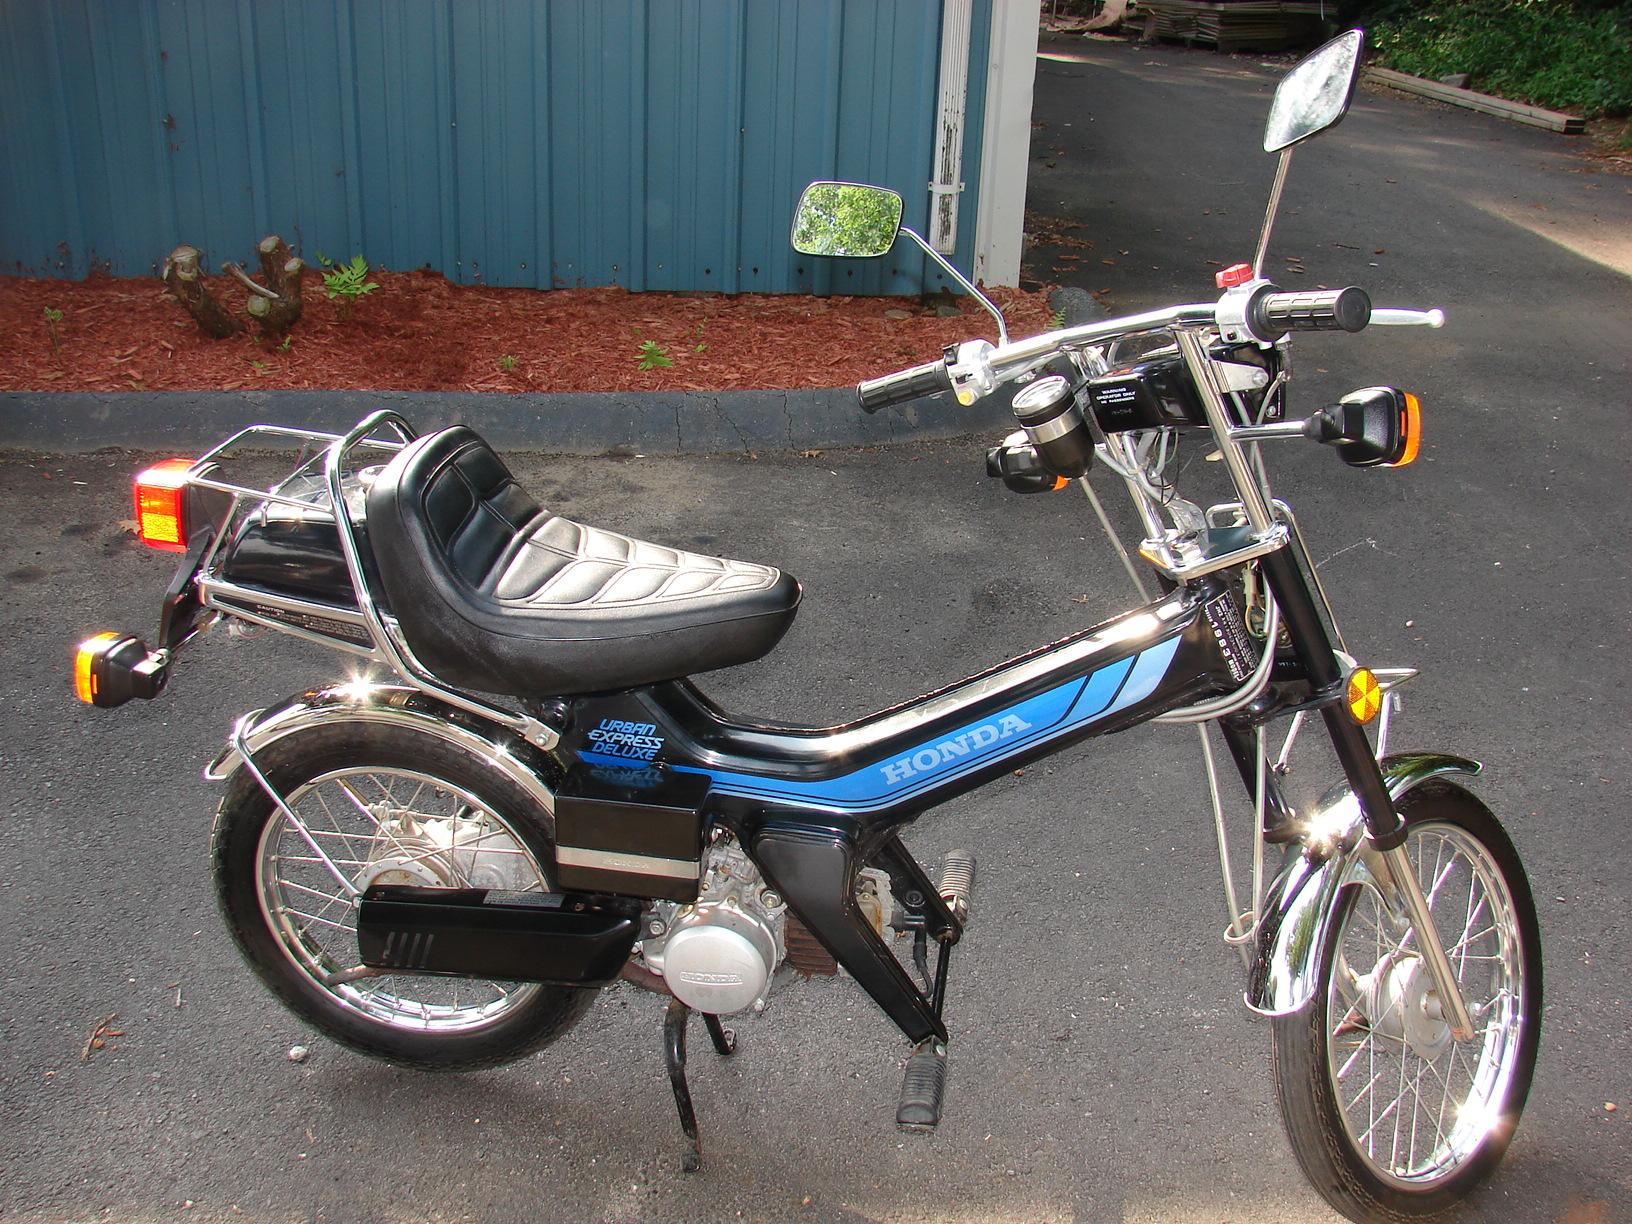 honda urban express | Tomahawk Mopeds